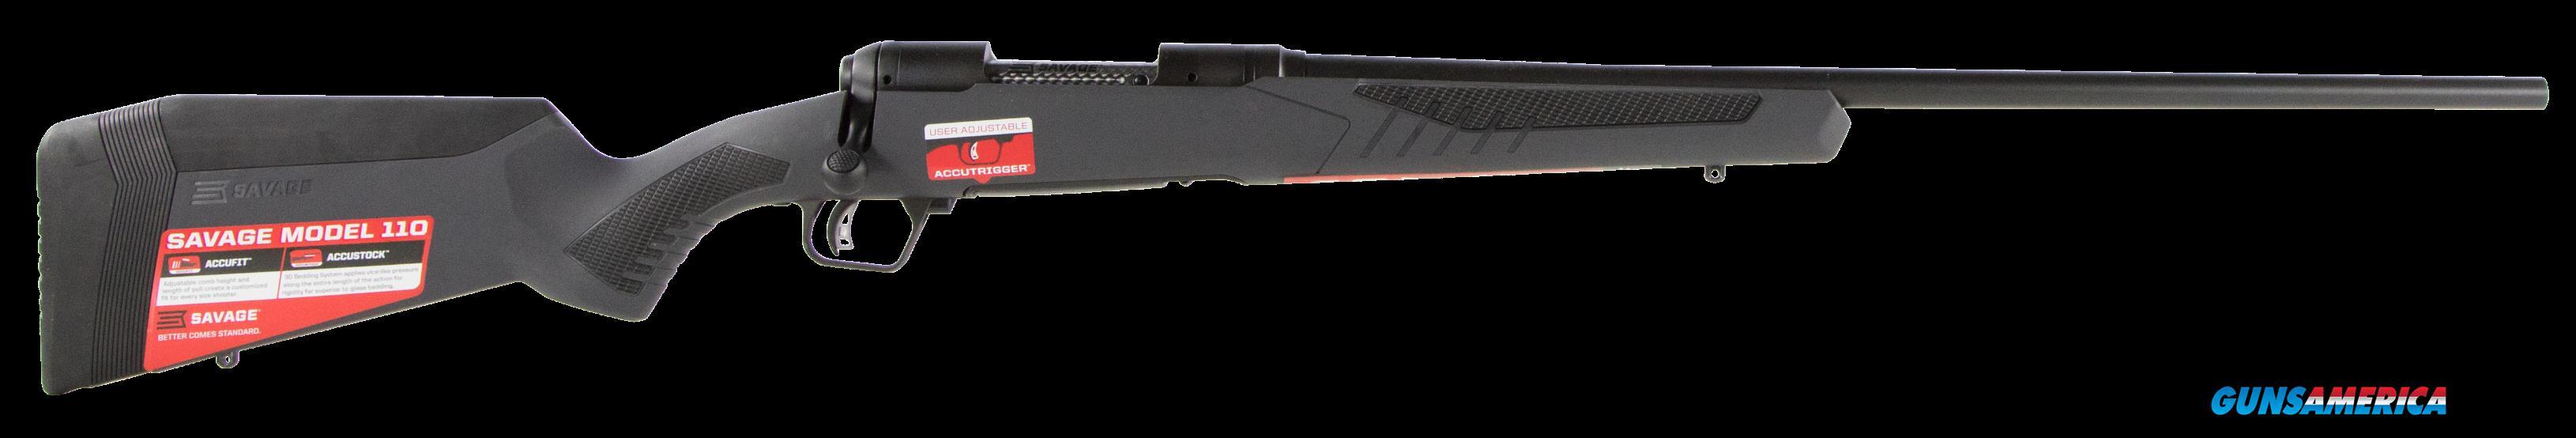 Savage 10-110, Sav 57173 110 Hunter 6.5 Crd  Guns > Pistols > 1911 Pistol Copies (non-Colt)